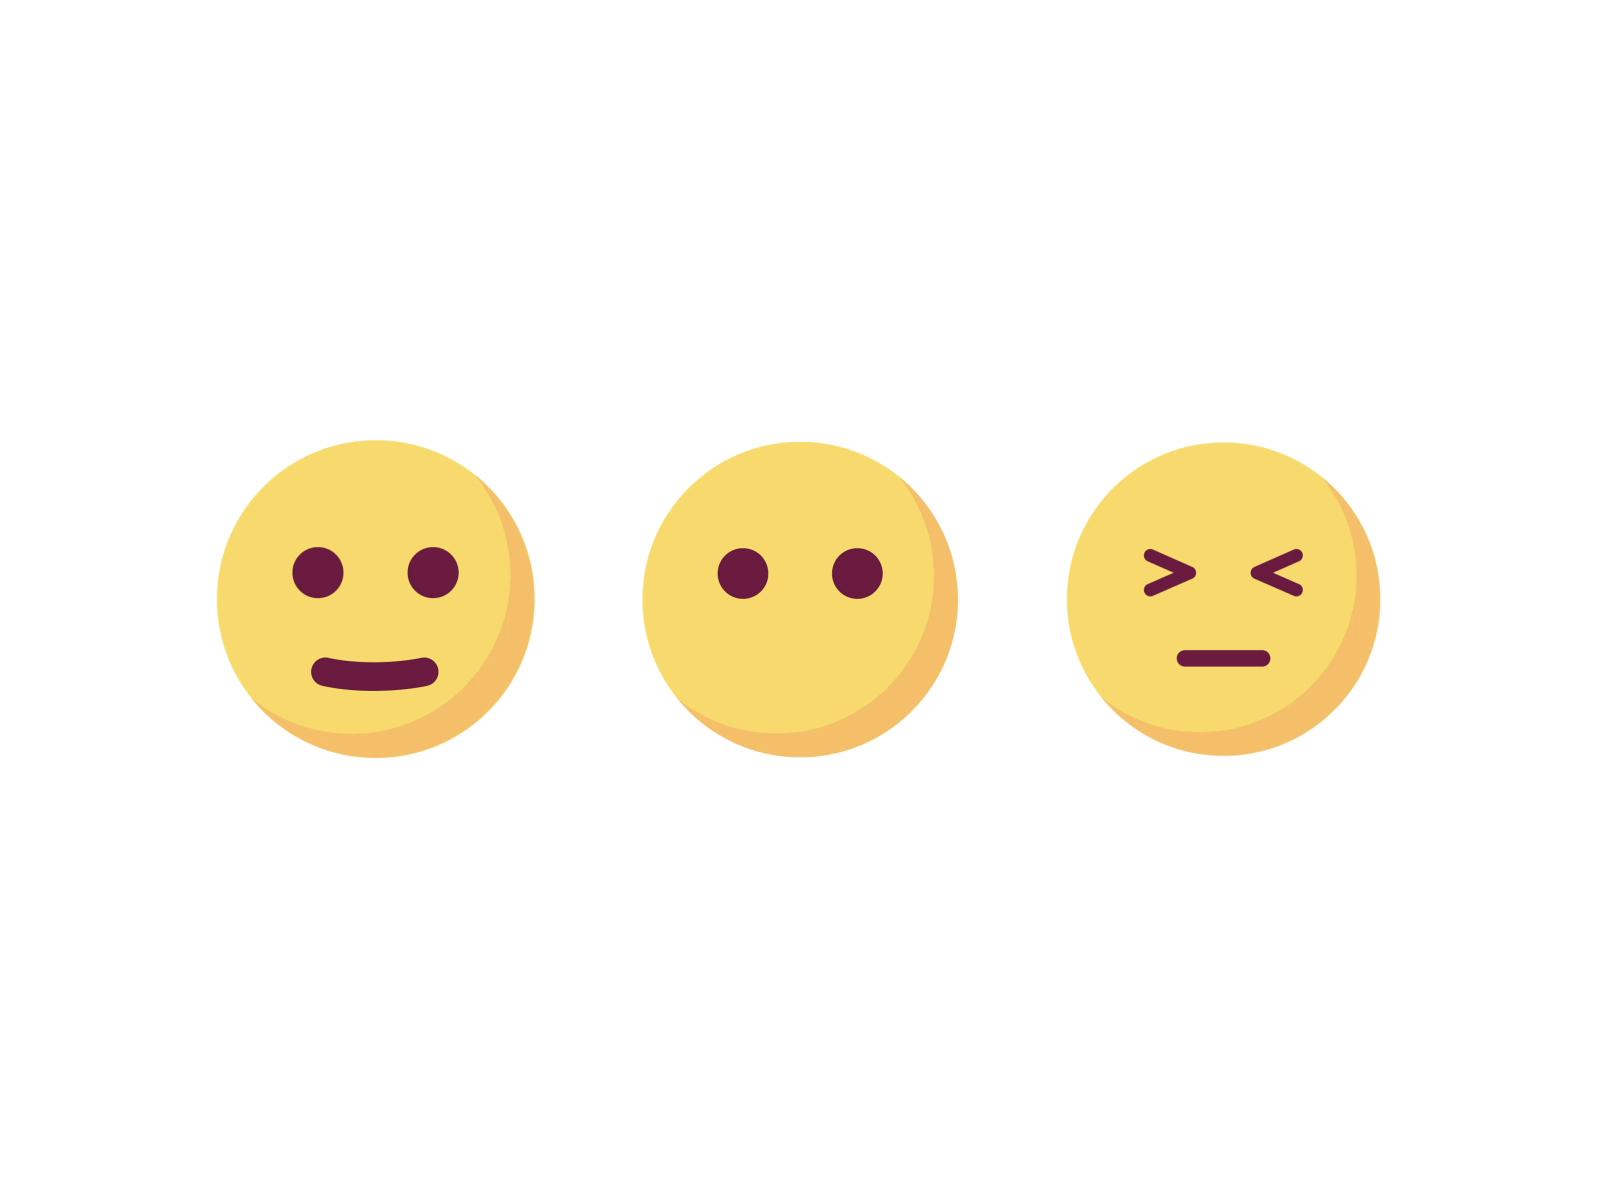 3 emojis 1600x1200